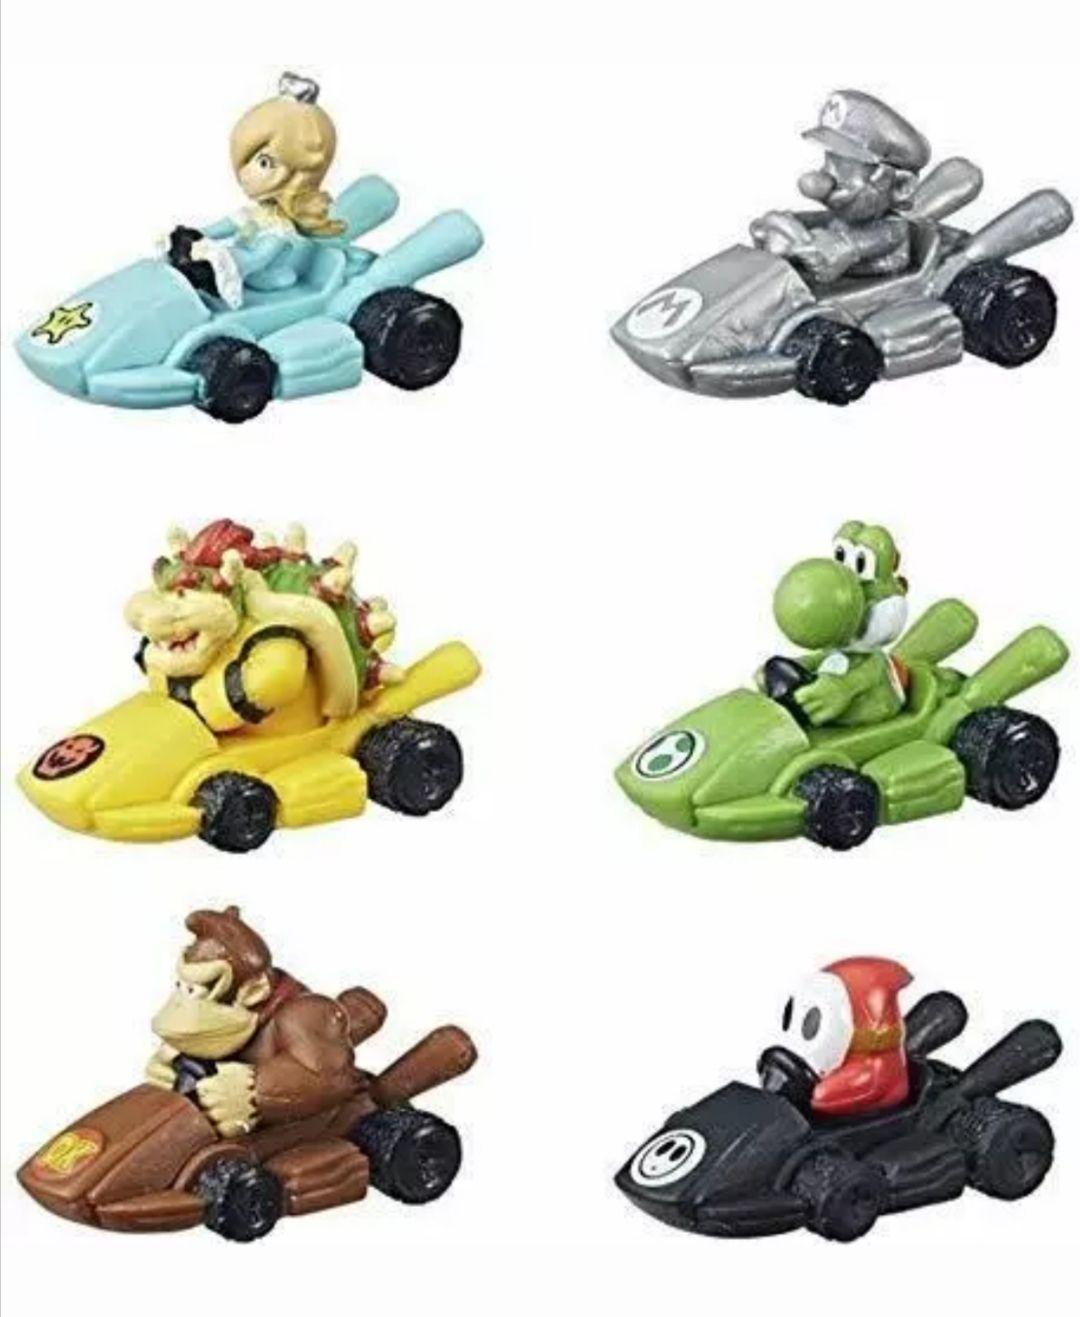 Super Precio. Pack 6 figuras con carta de poder para Monopoly Mario Kart